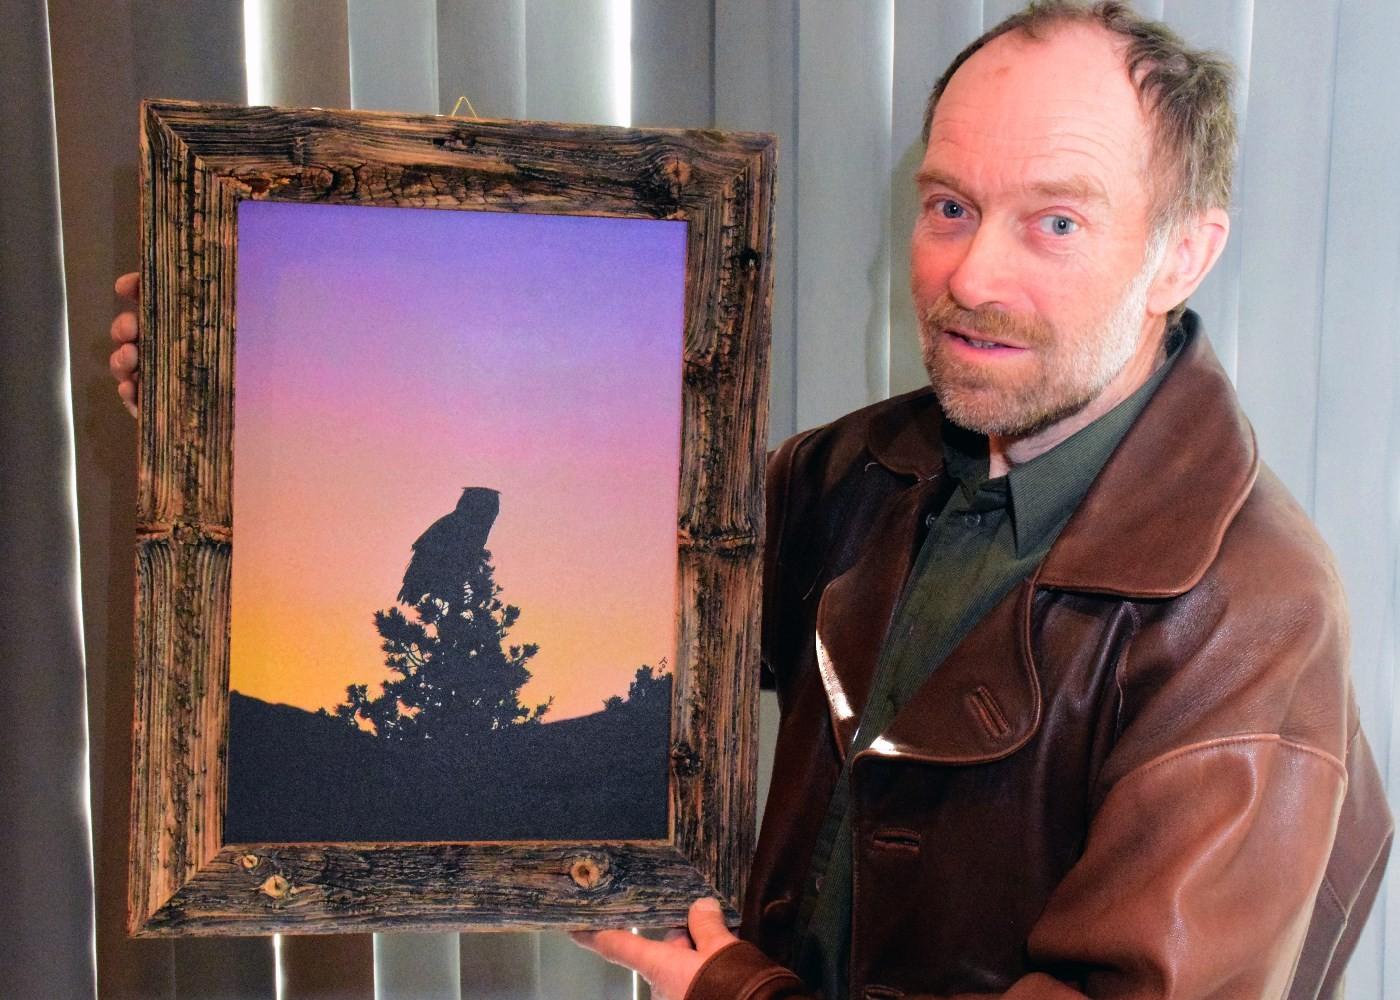 Nils Olav Talgøy opna si første separatutstilling på Tingvoll i helga.  Foto: Driva/Jon Olav Ørsal